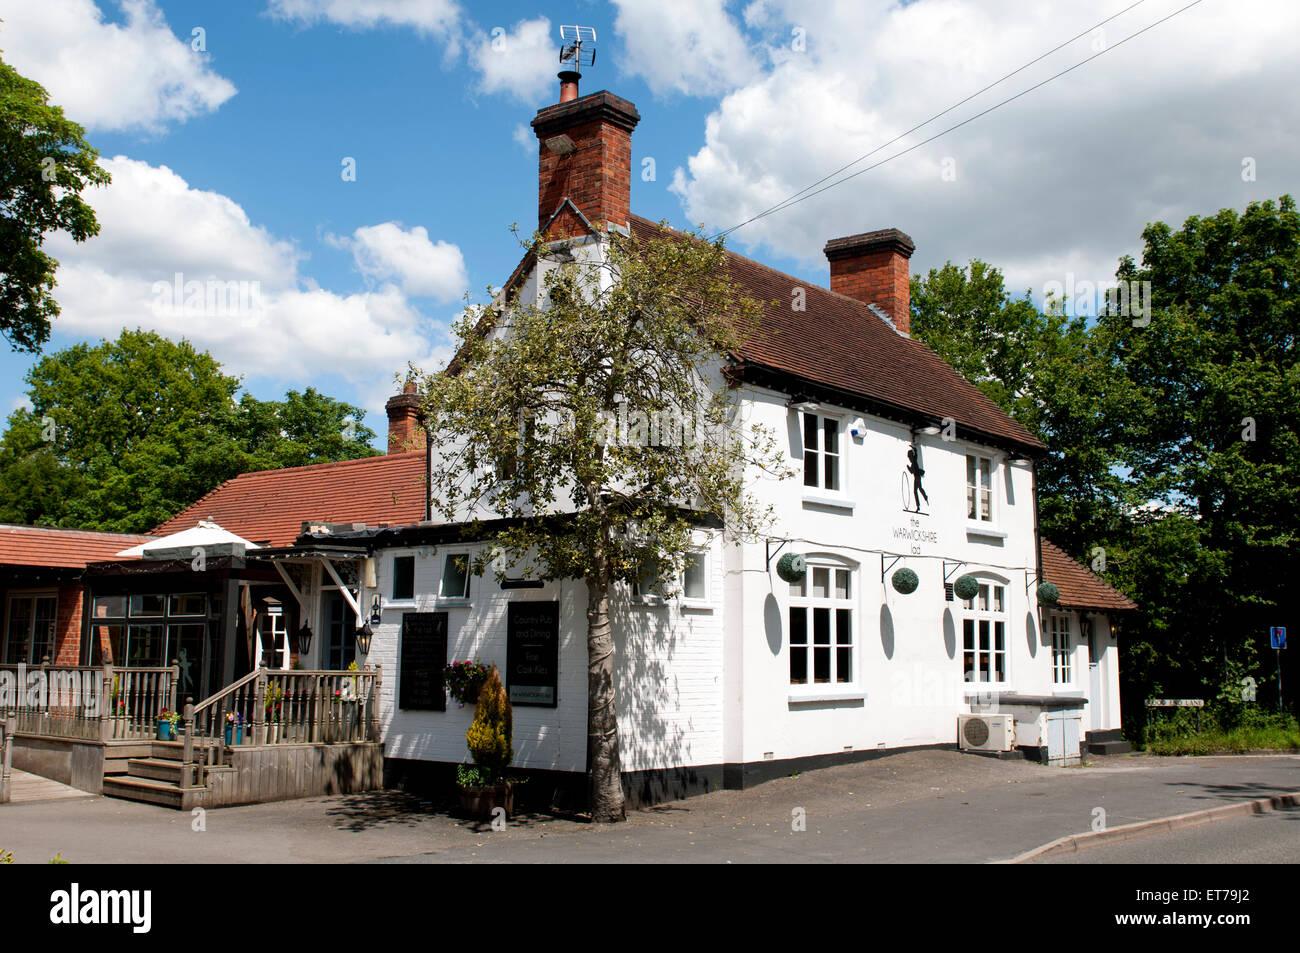 The Warwickshire Lad pub, Wood End, Warwickshire, England, UK - Stock Image